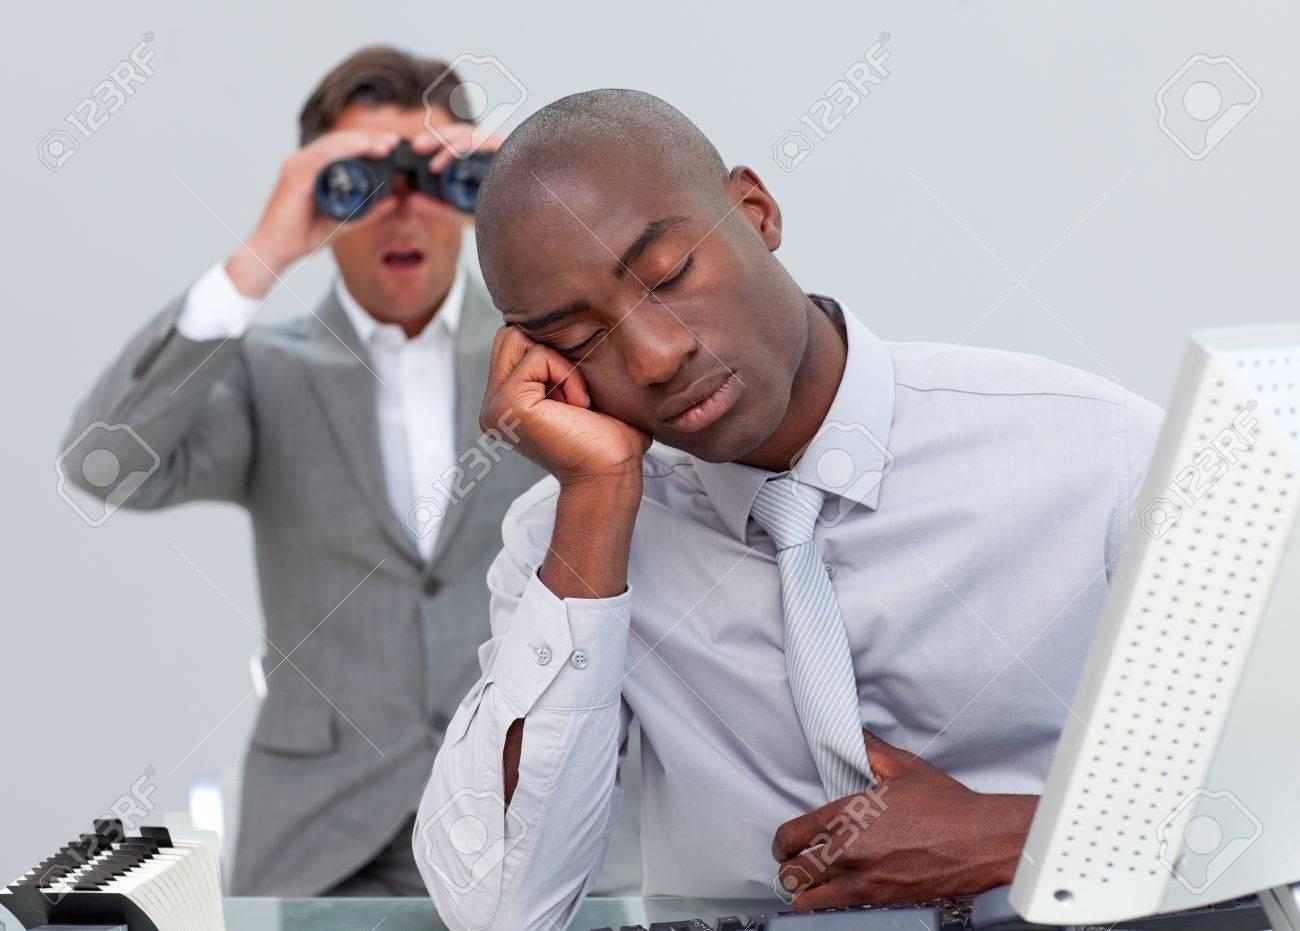 Ethnic businessman annoyed by a man looking through binoculars Stock Photo - 10091180